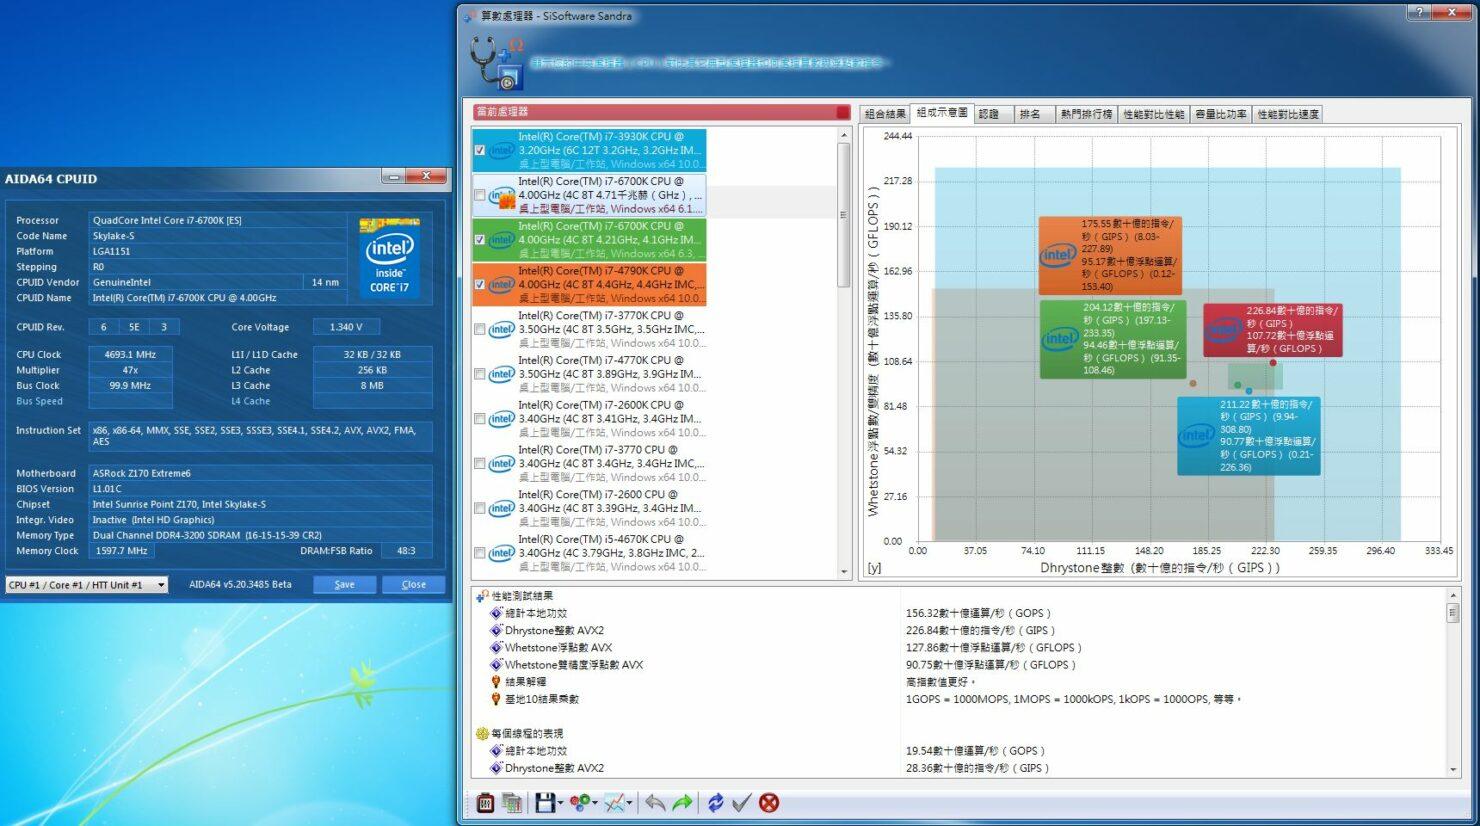 intel-core-i7-6700k_oc_sandra-cpu